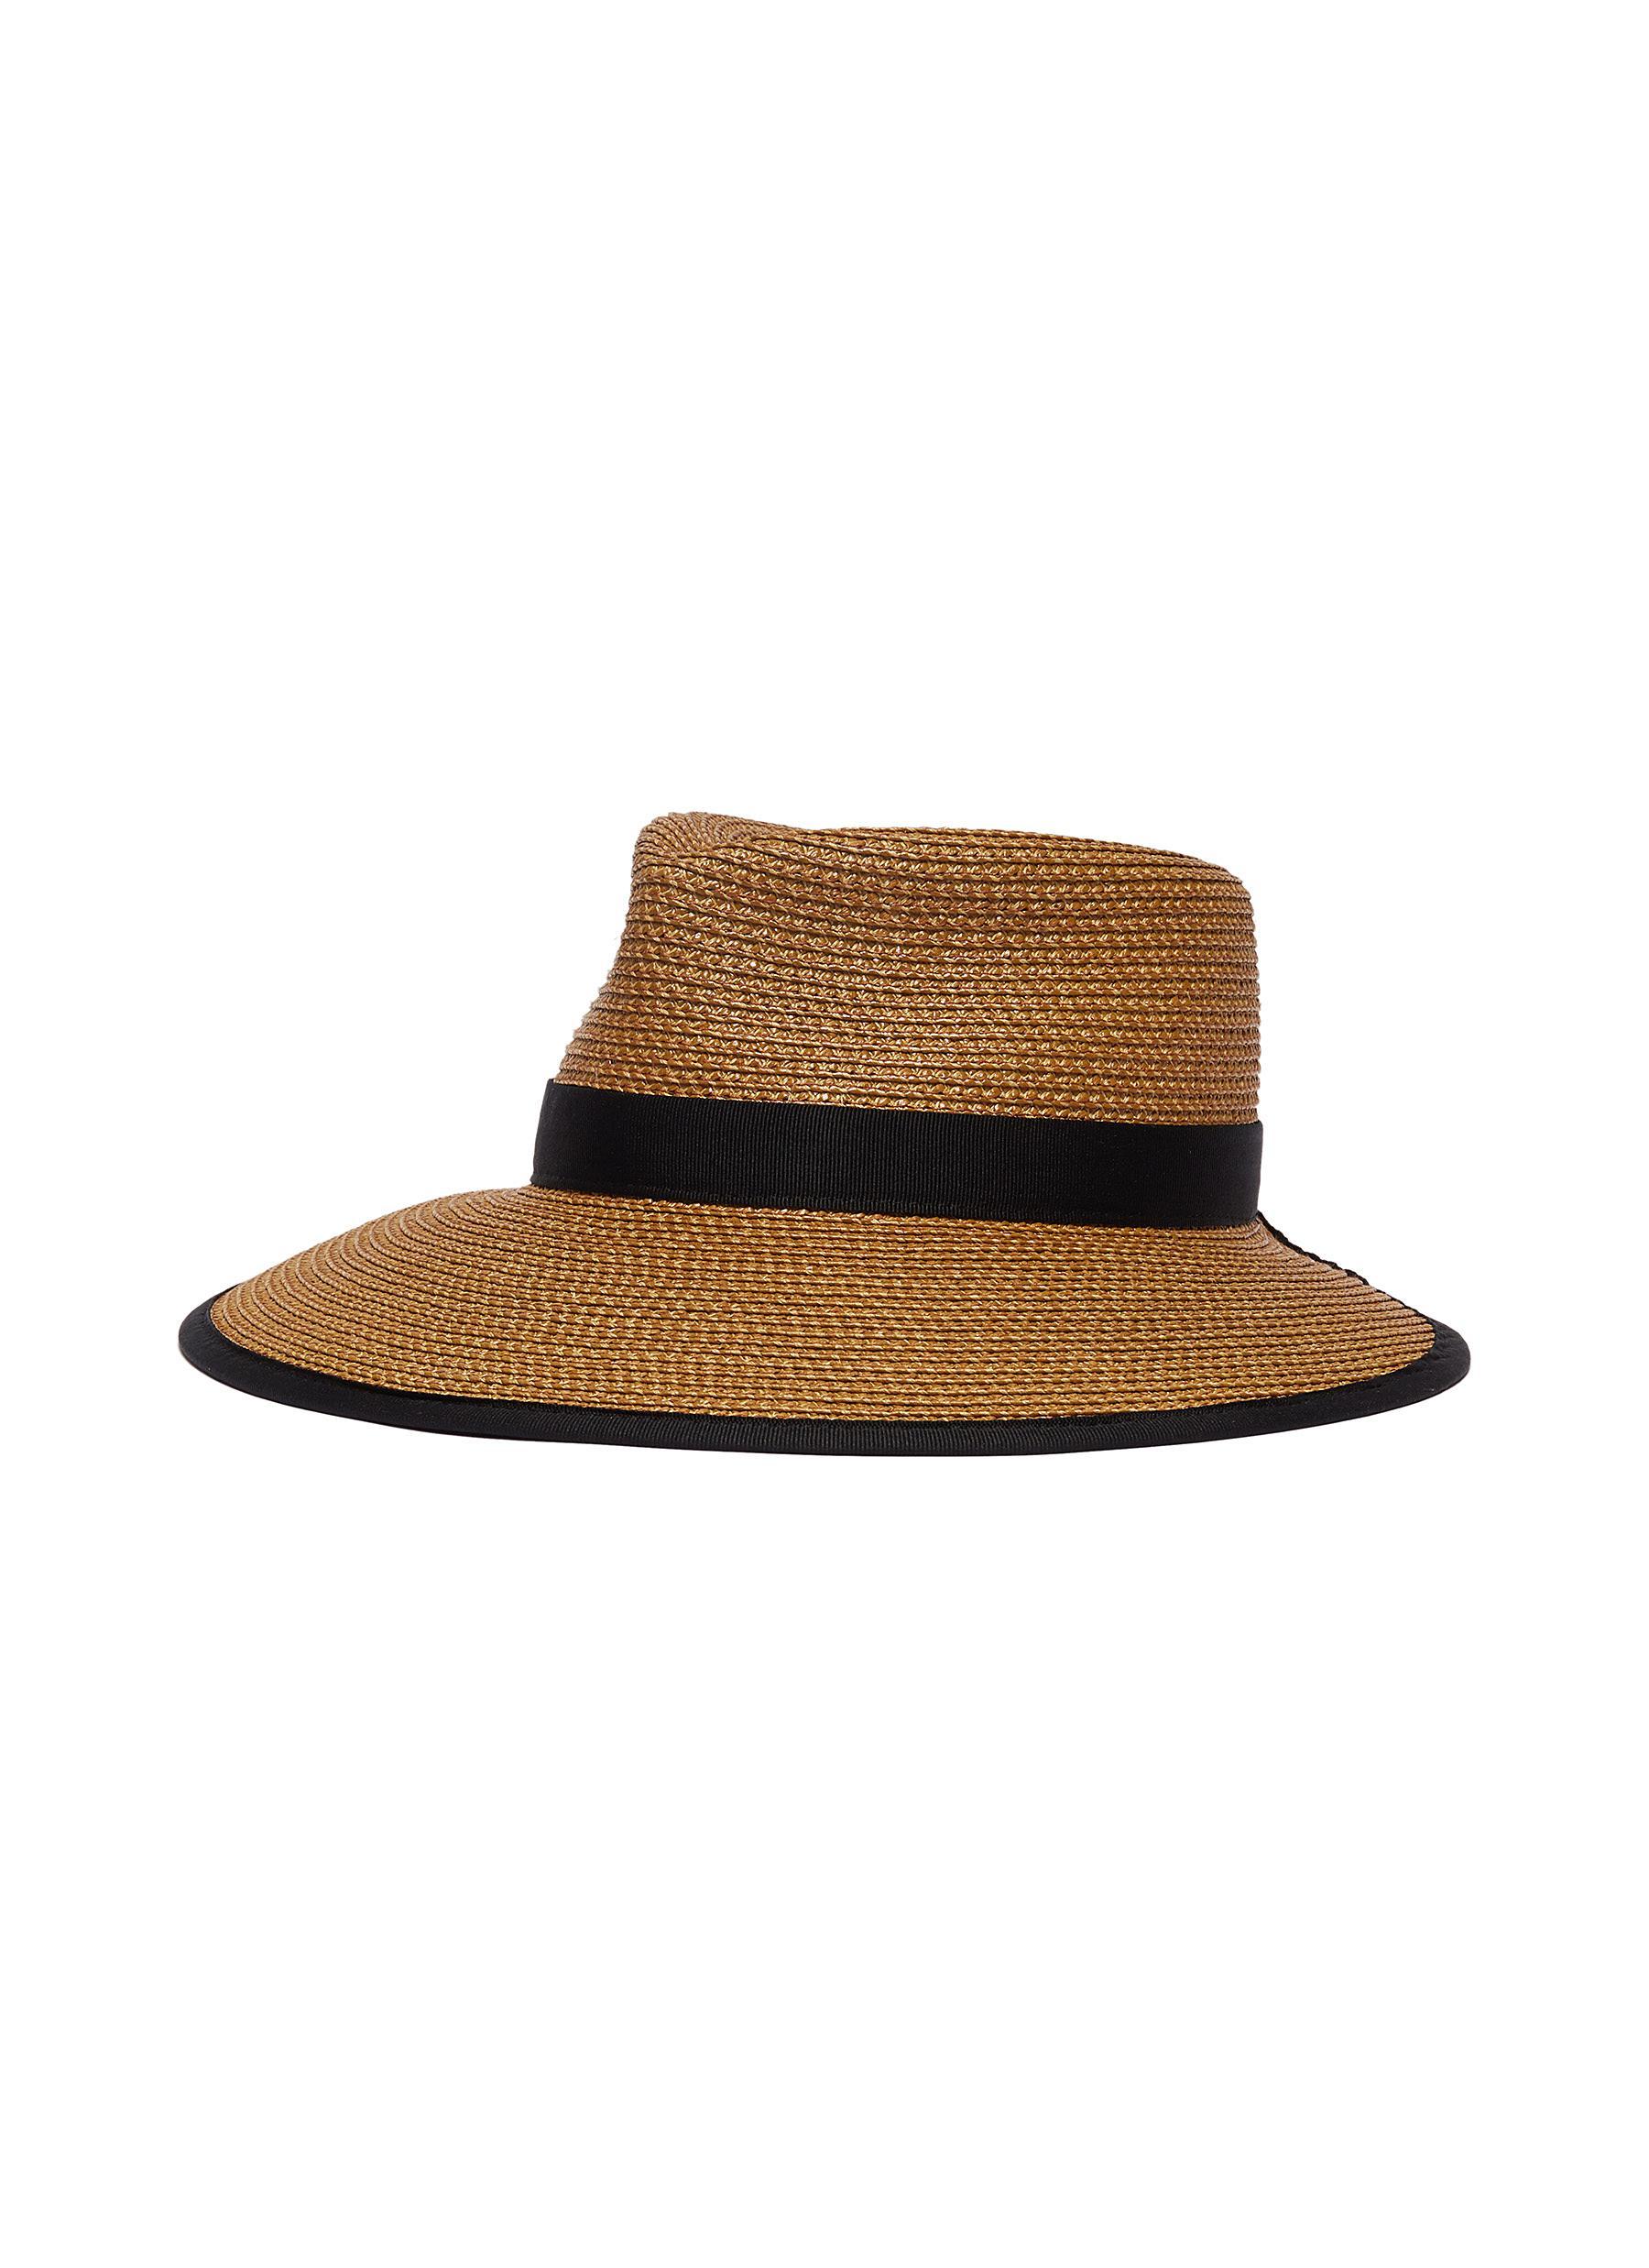 0ae54fcb22e Eric Javits.  Sun Crest  Squishee® hat